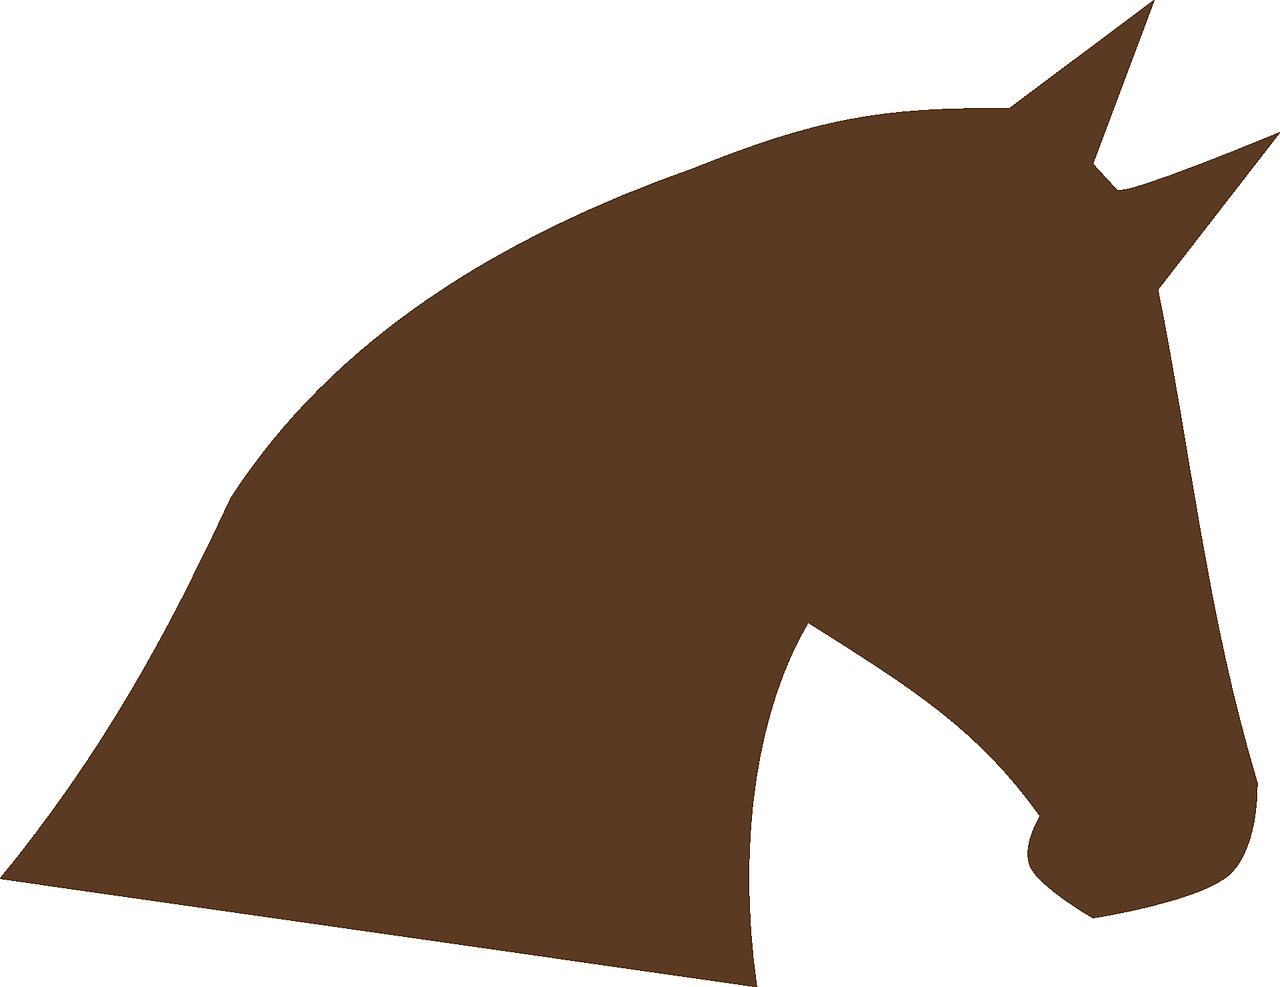 Farmhouse clipart horse. Head silhouette animal transparent